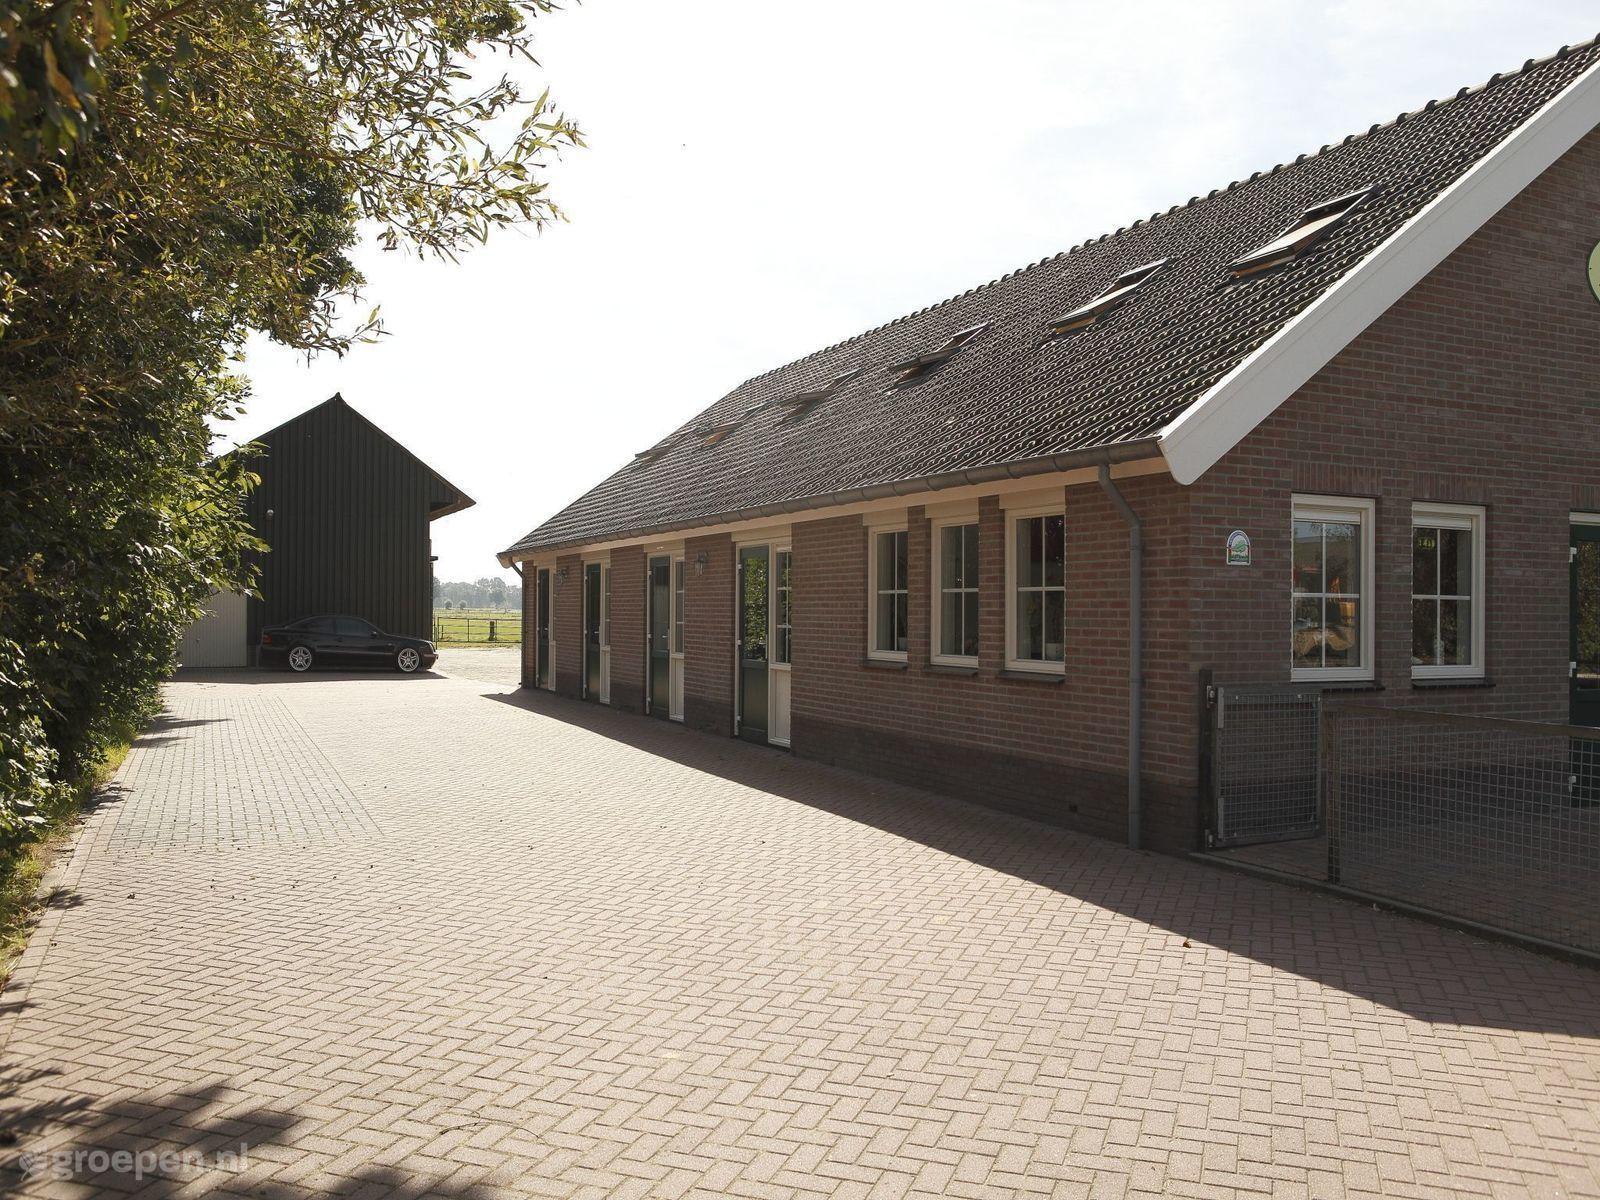 Groepsaccommodatie Woudenberg